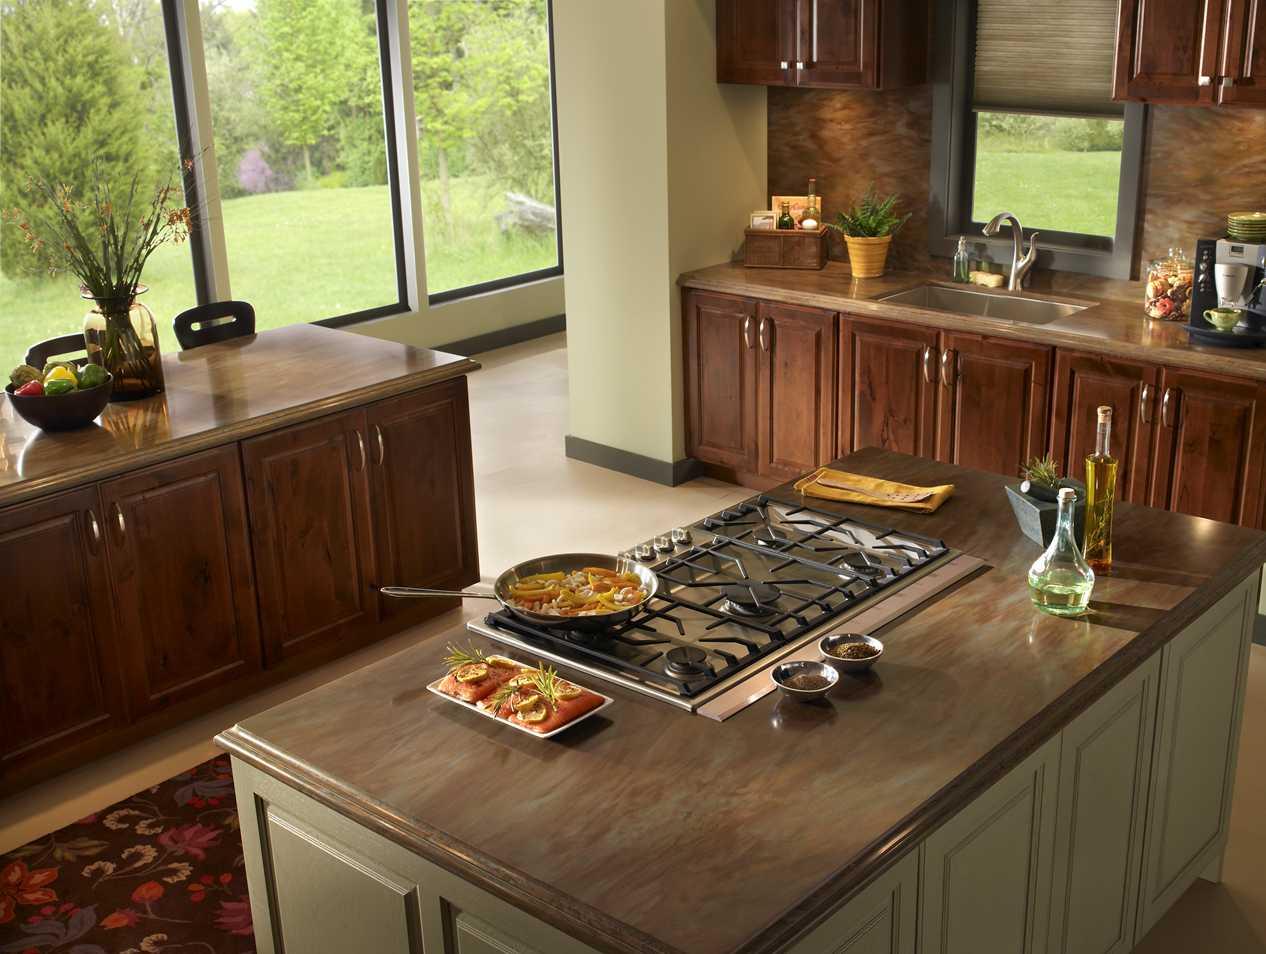 Natural Gas Kitchen Stove